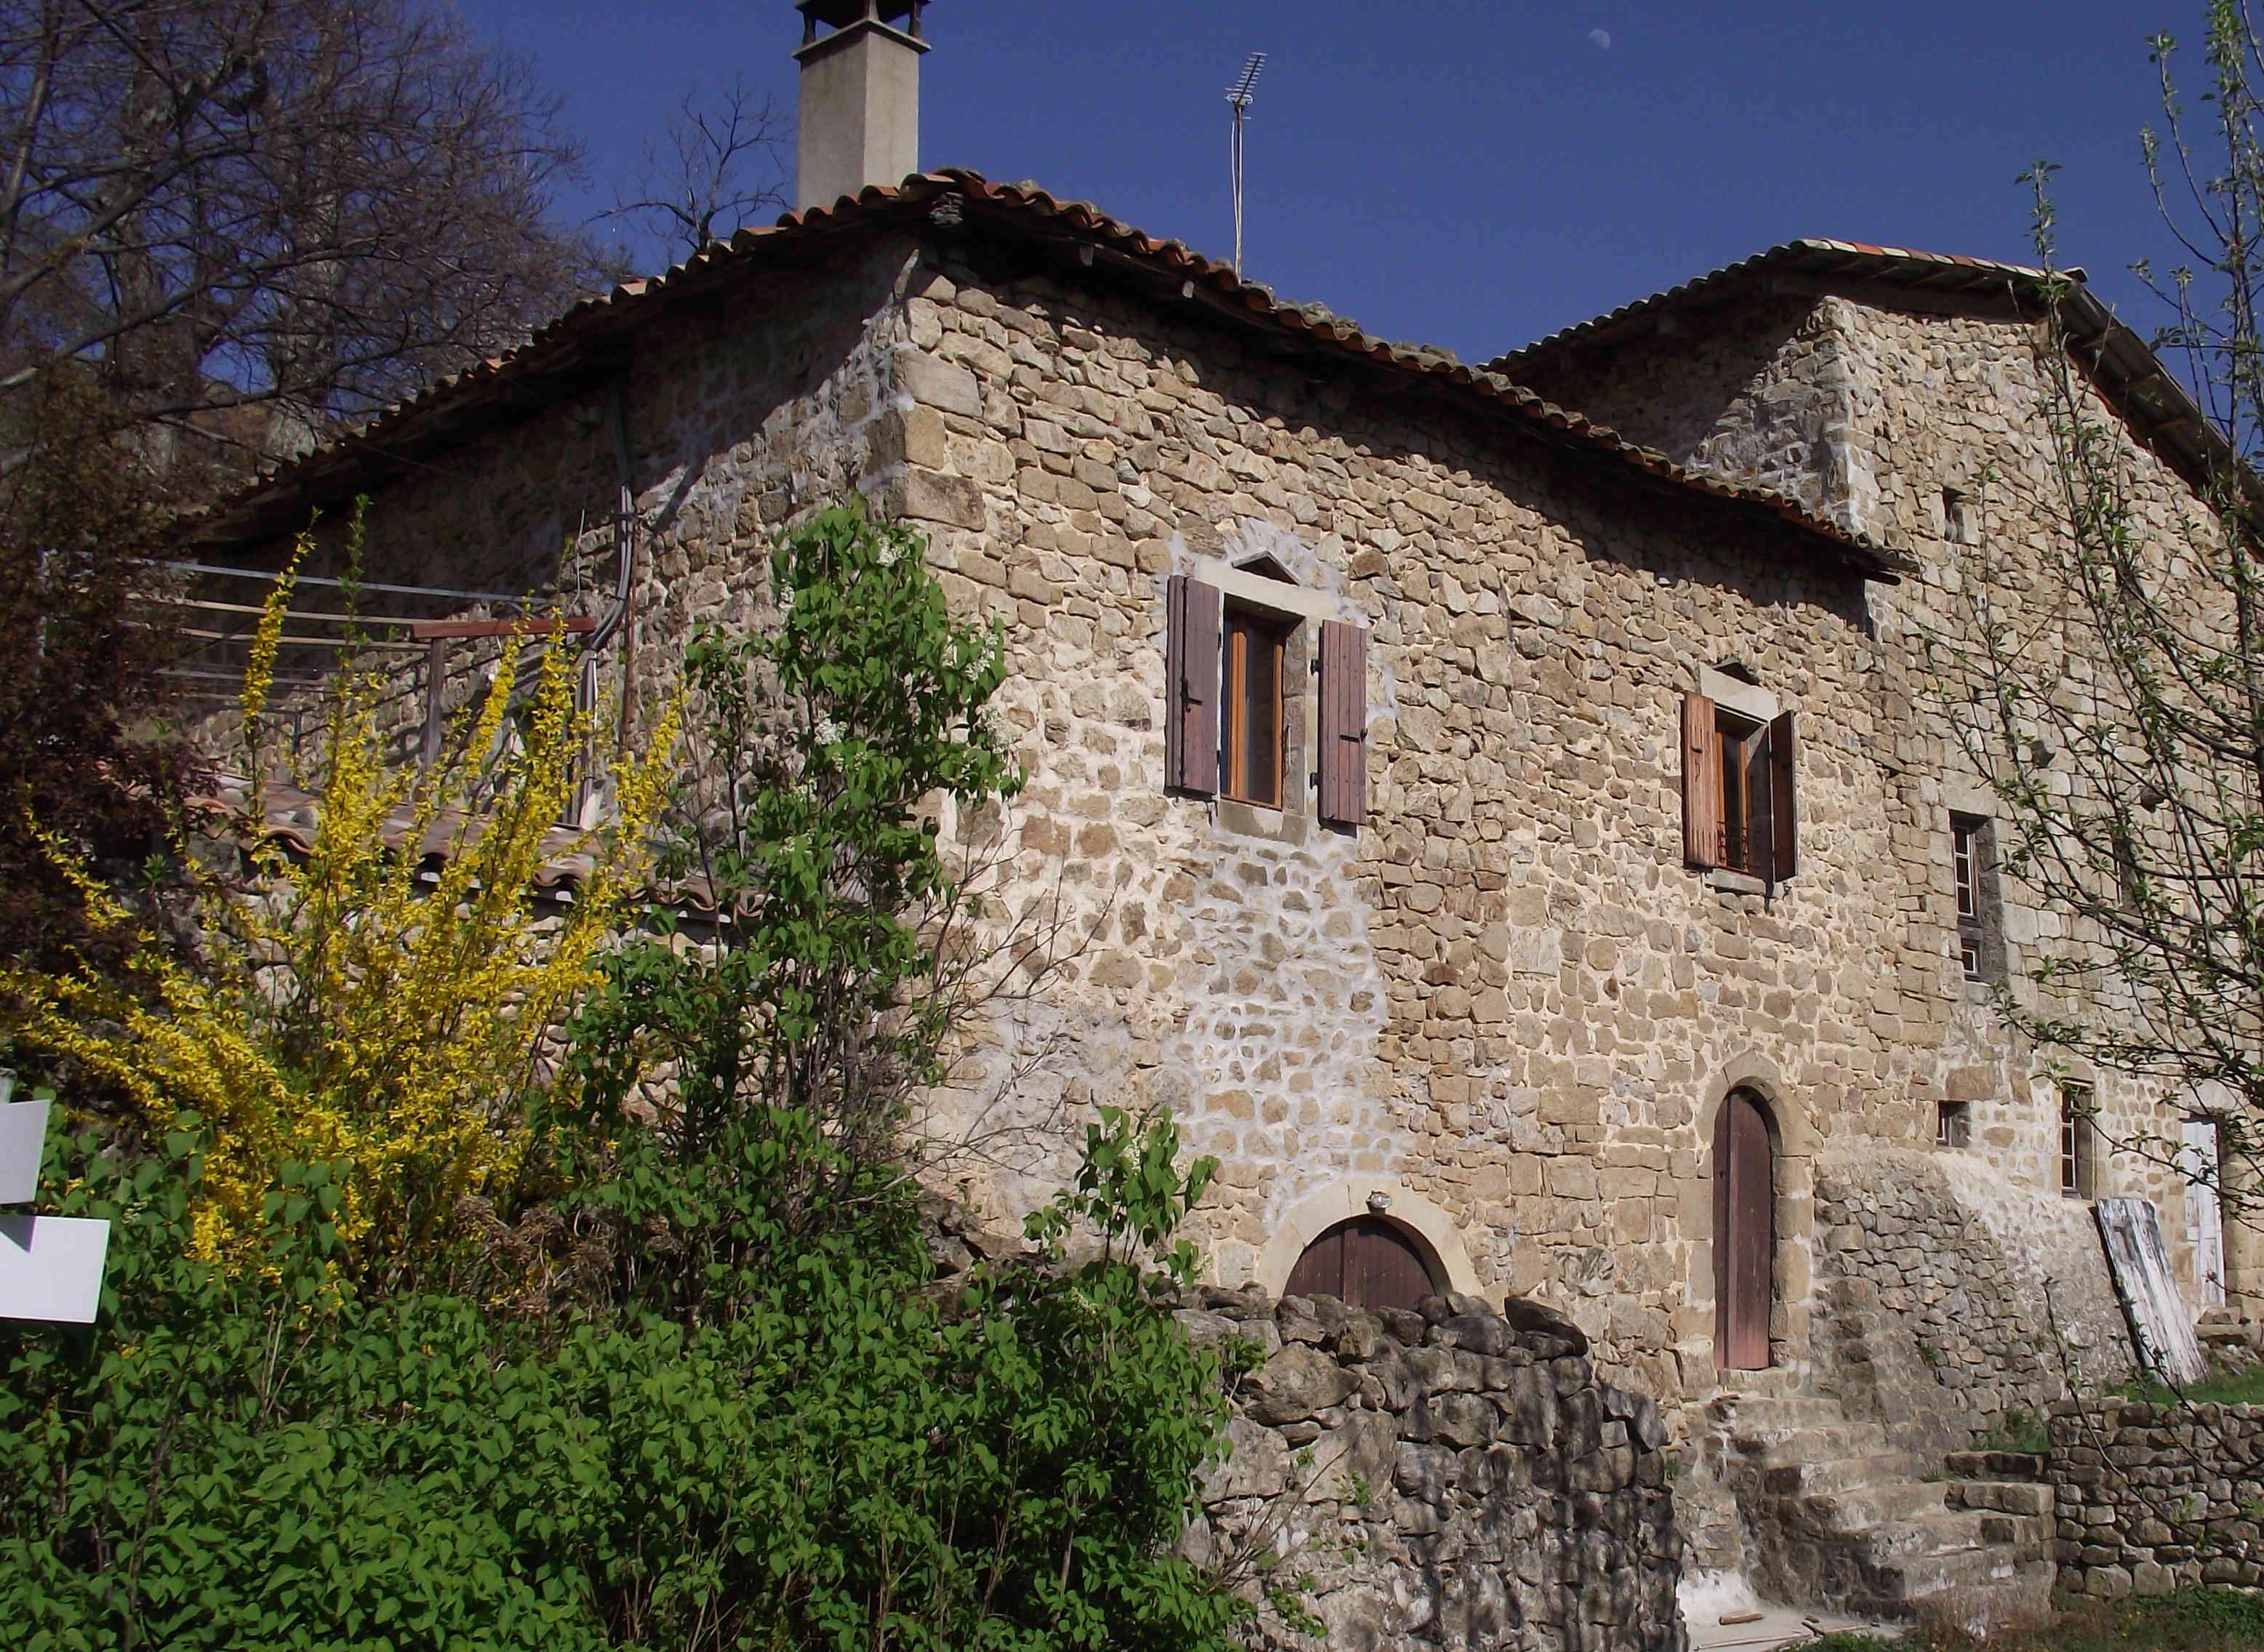 Location vacances Ardèche 07  Rhône Alpes Gite101